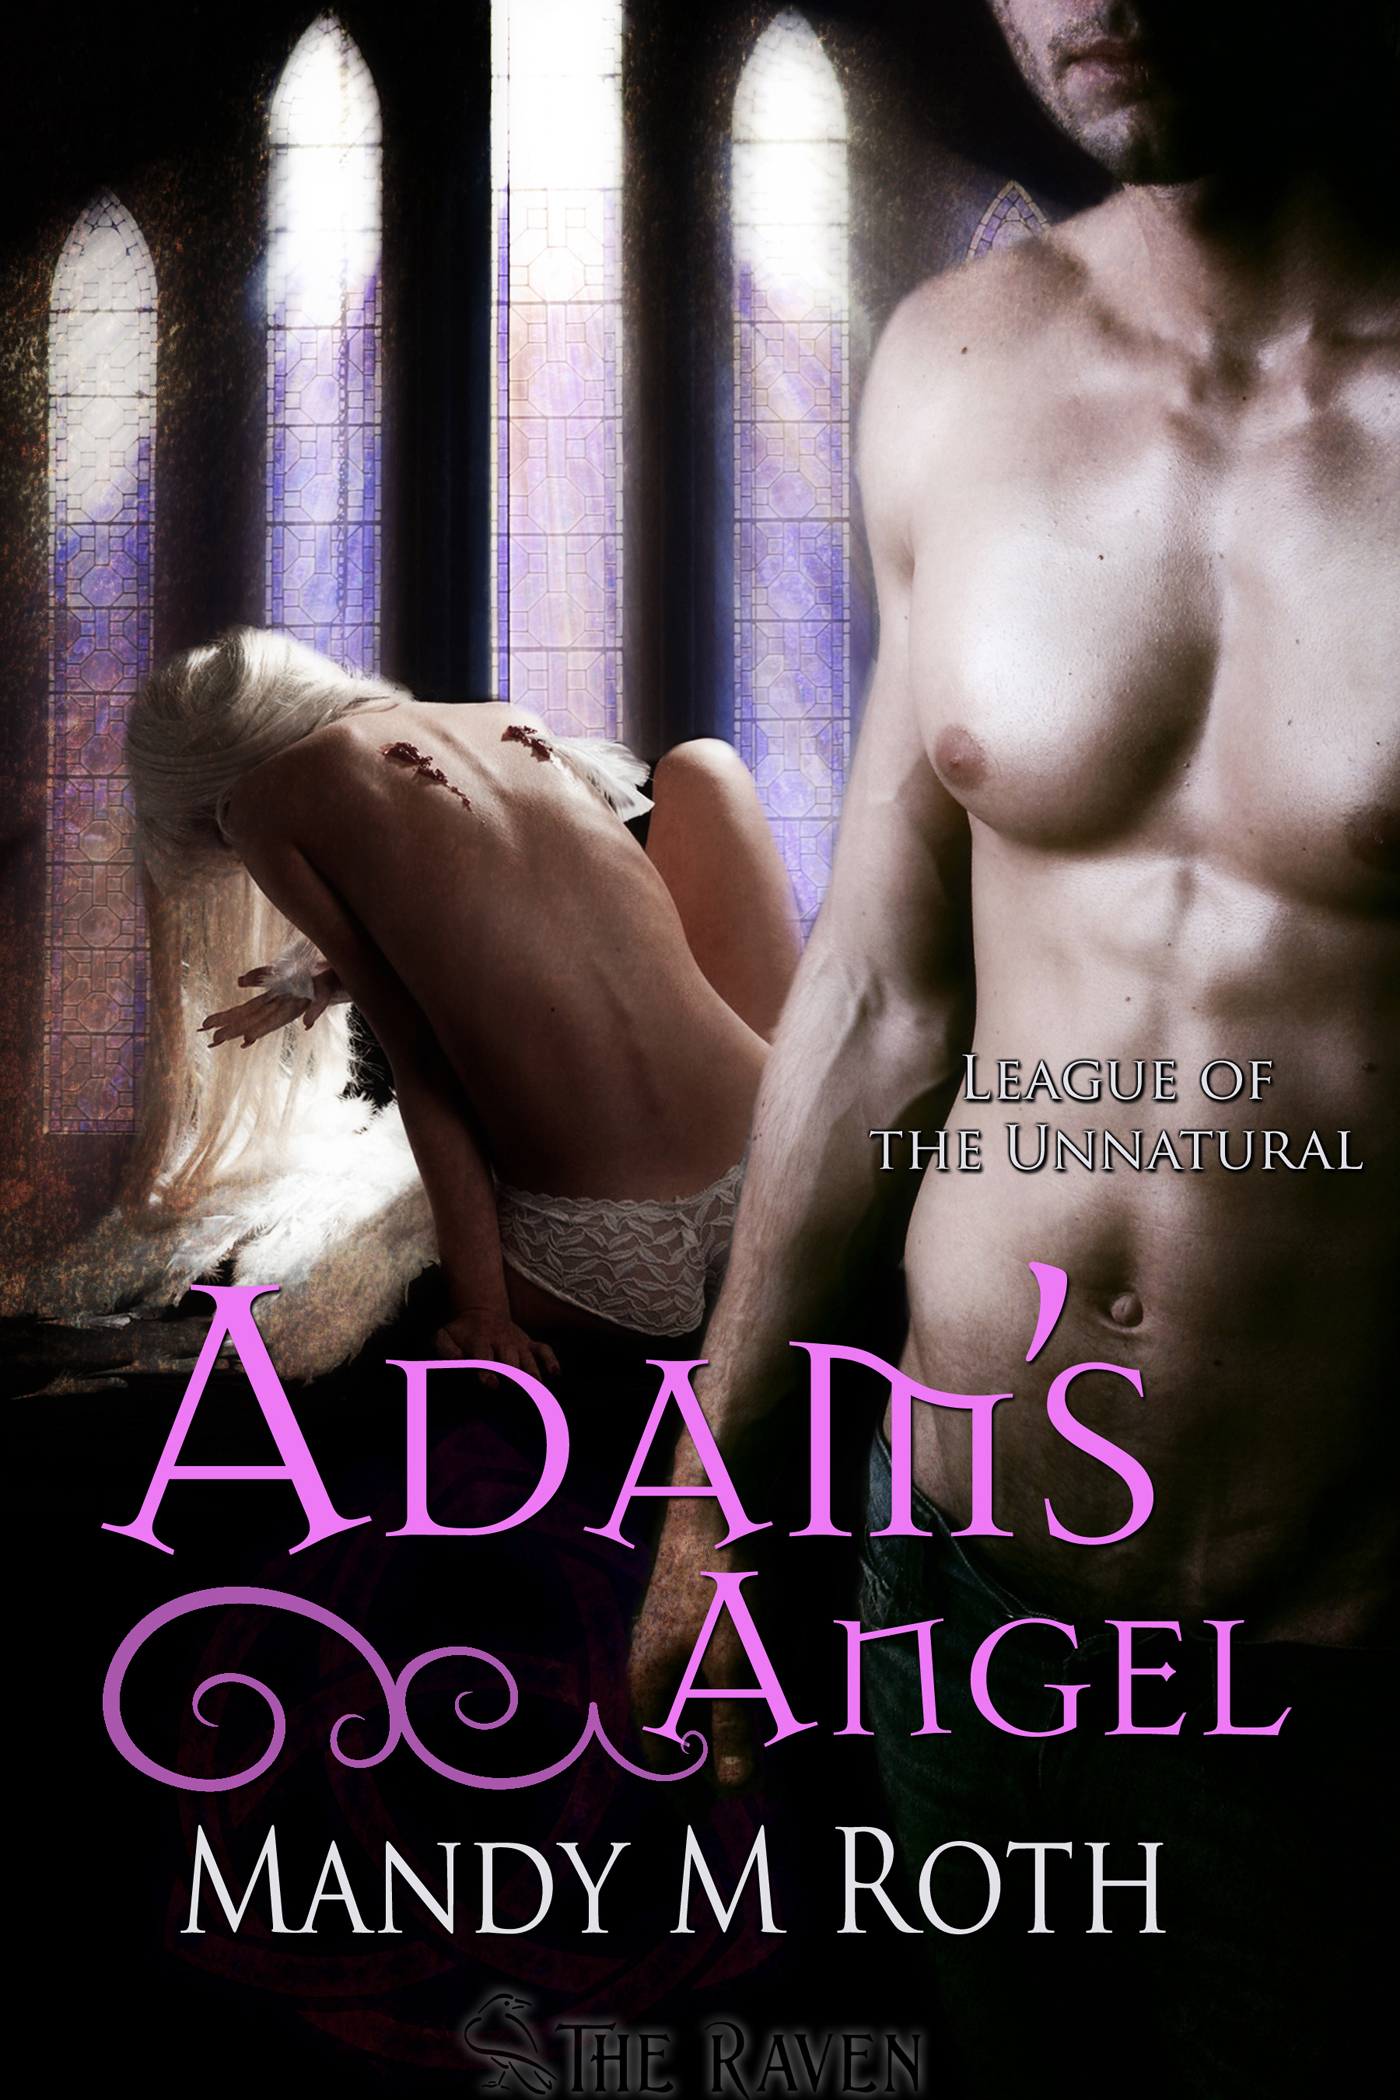 Mandy M. Roth - Adam's Angel